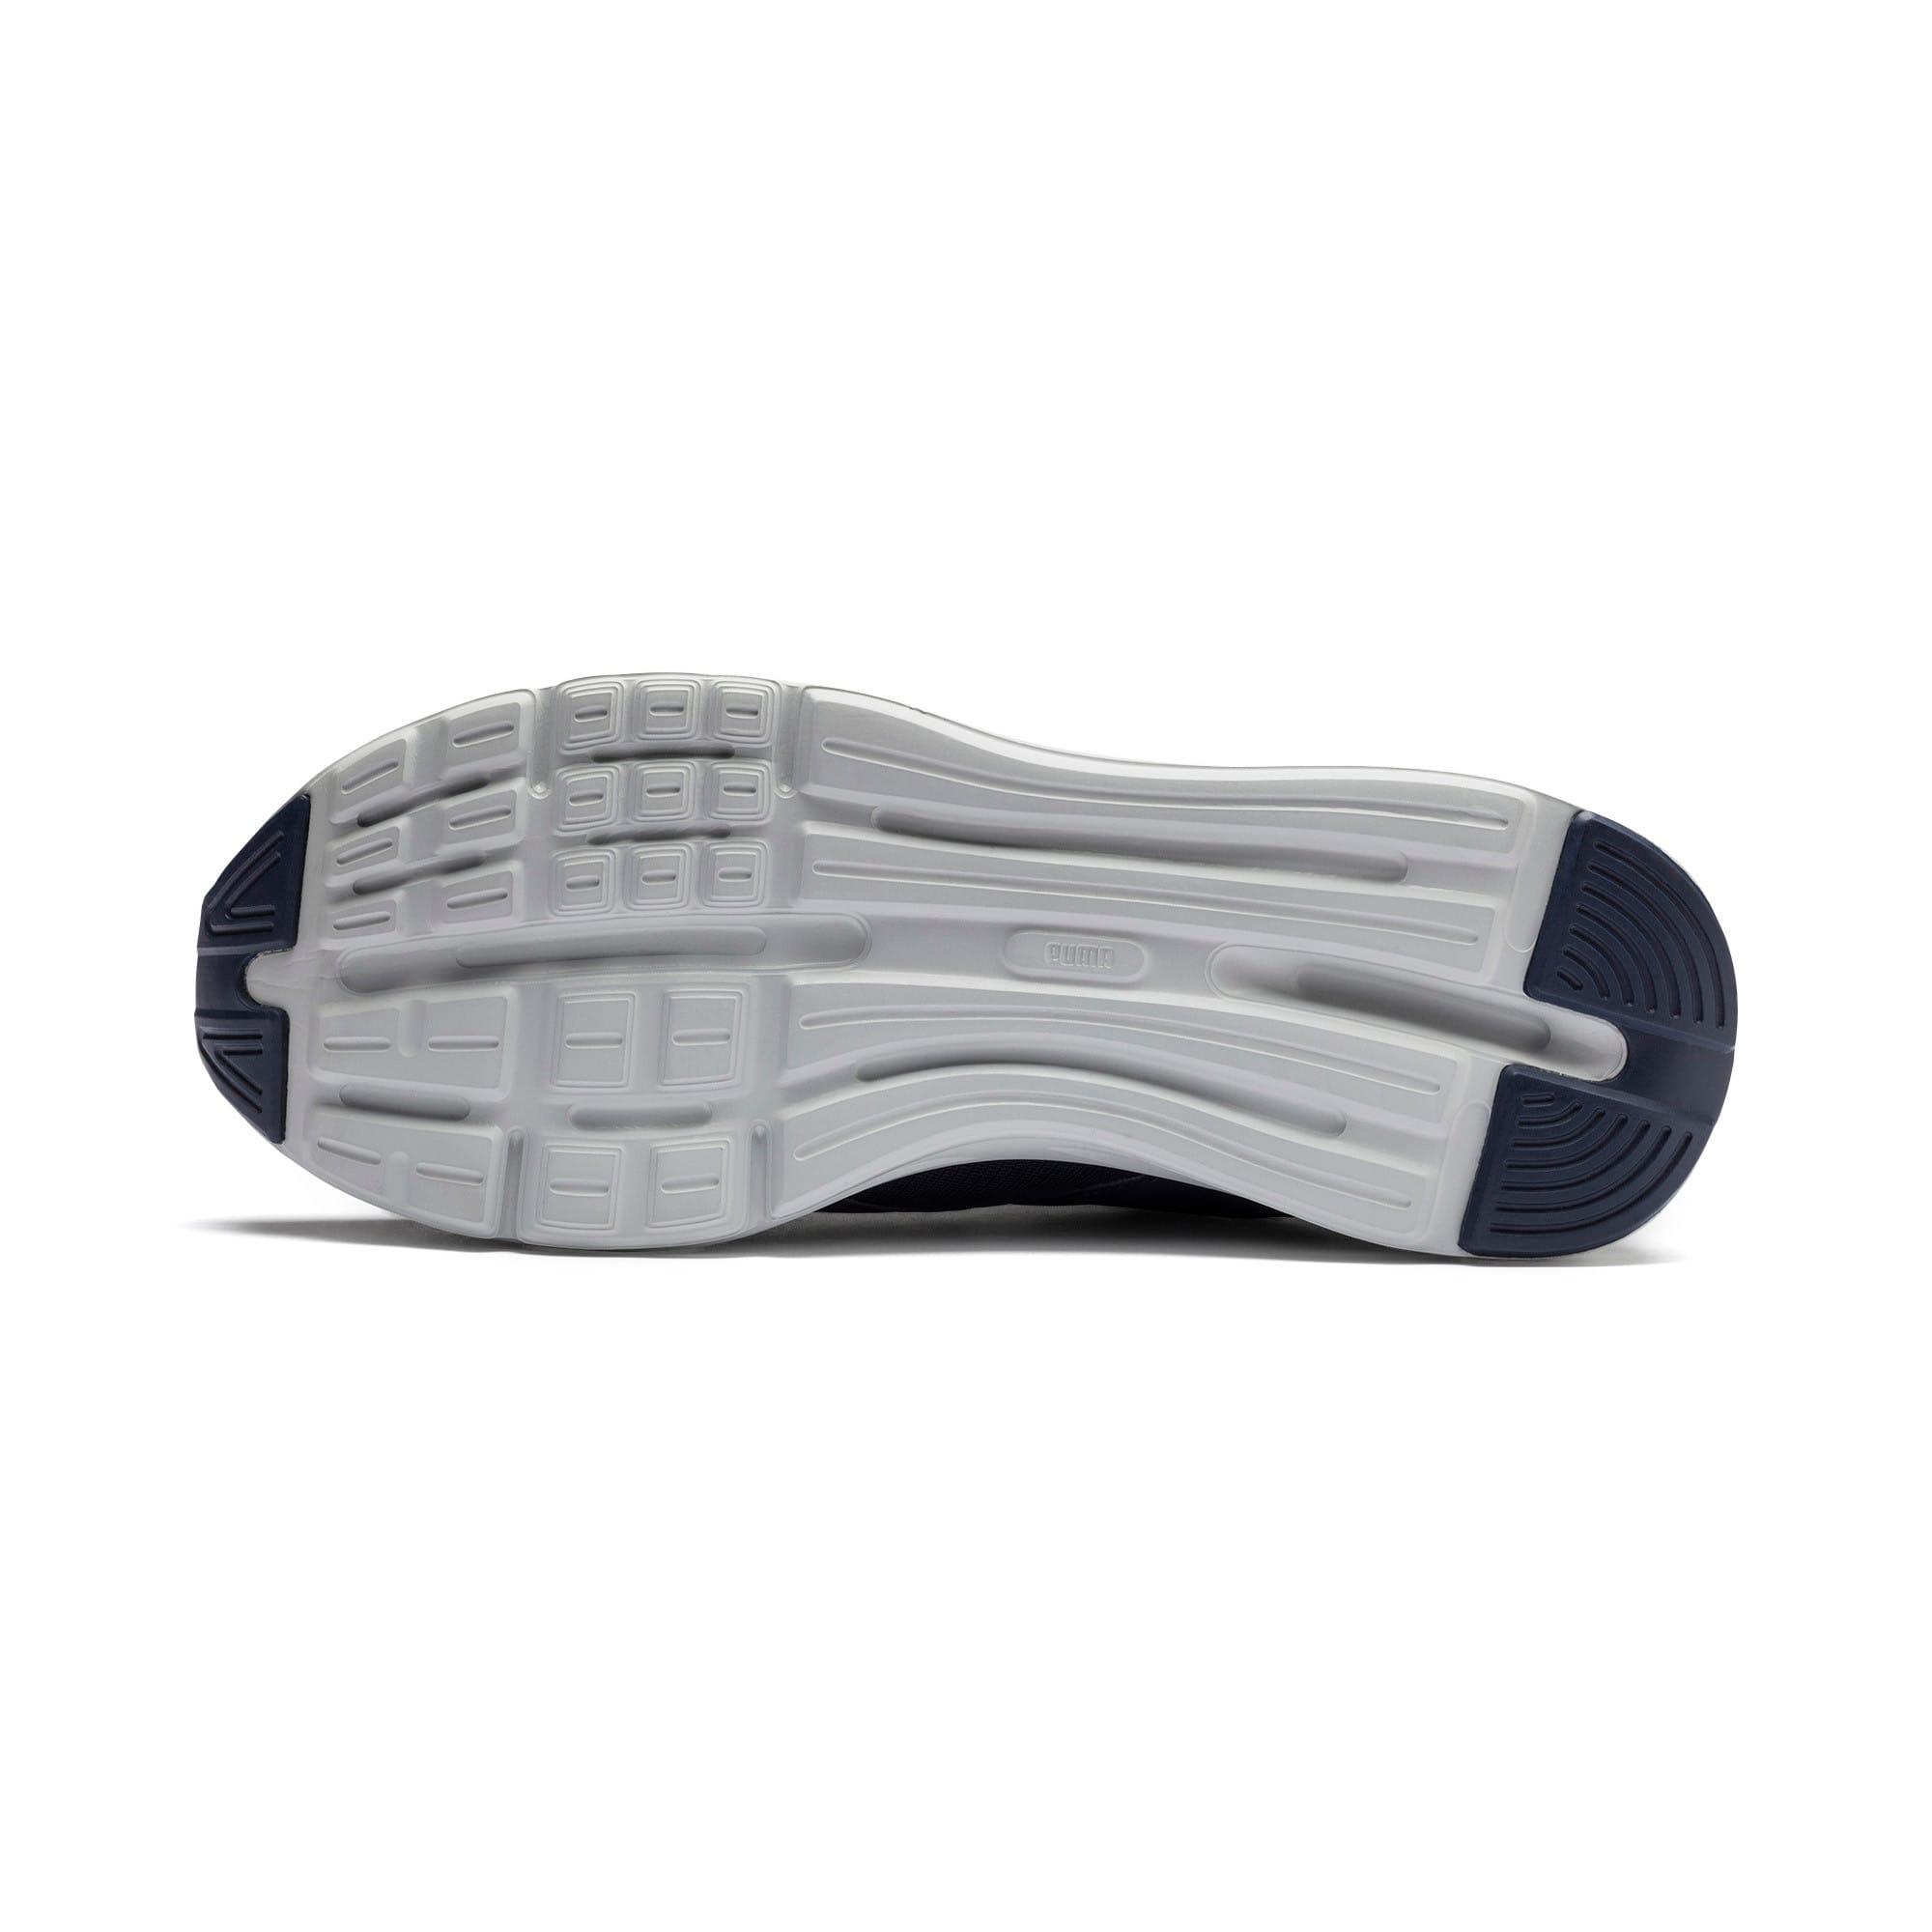 Thumbnail 3 of Enzo Geo Men's Sneakers, Peacoat, medium